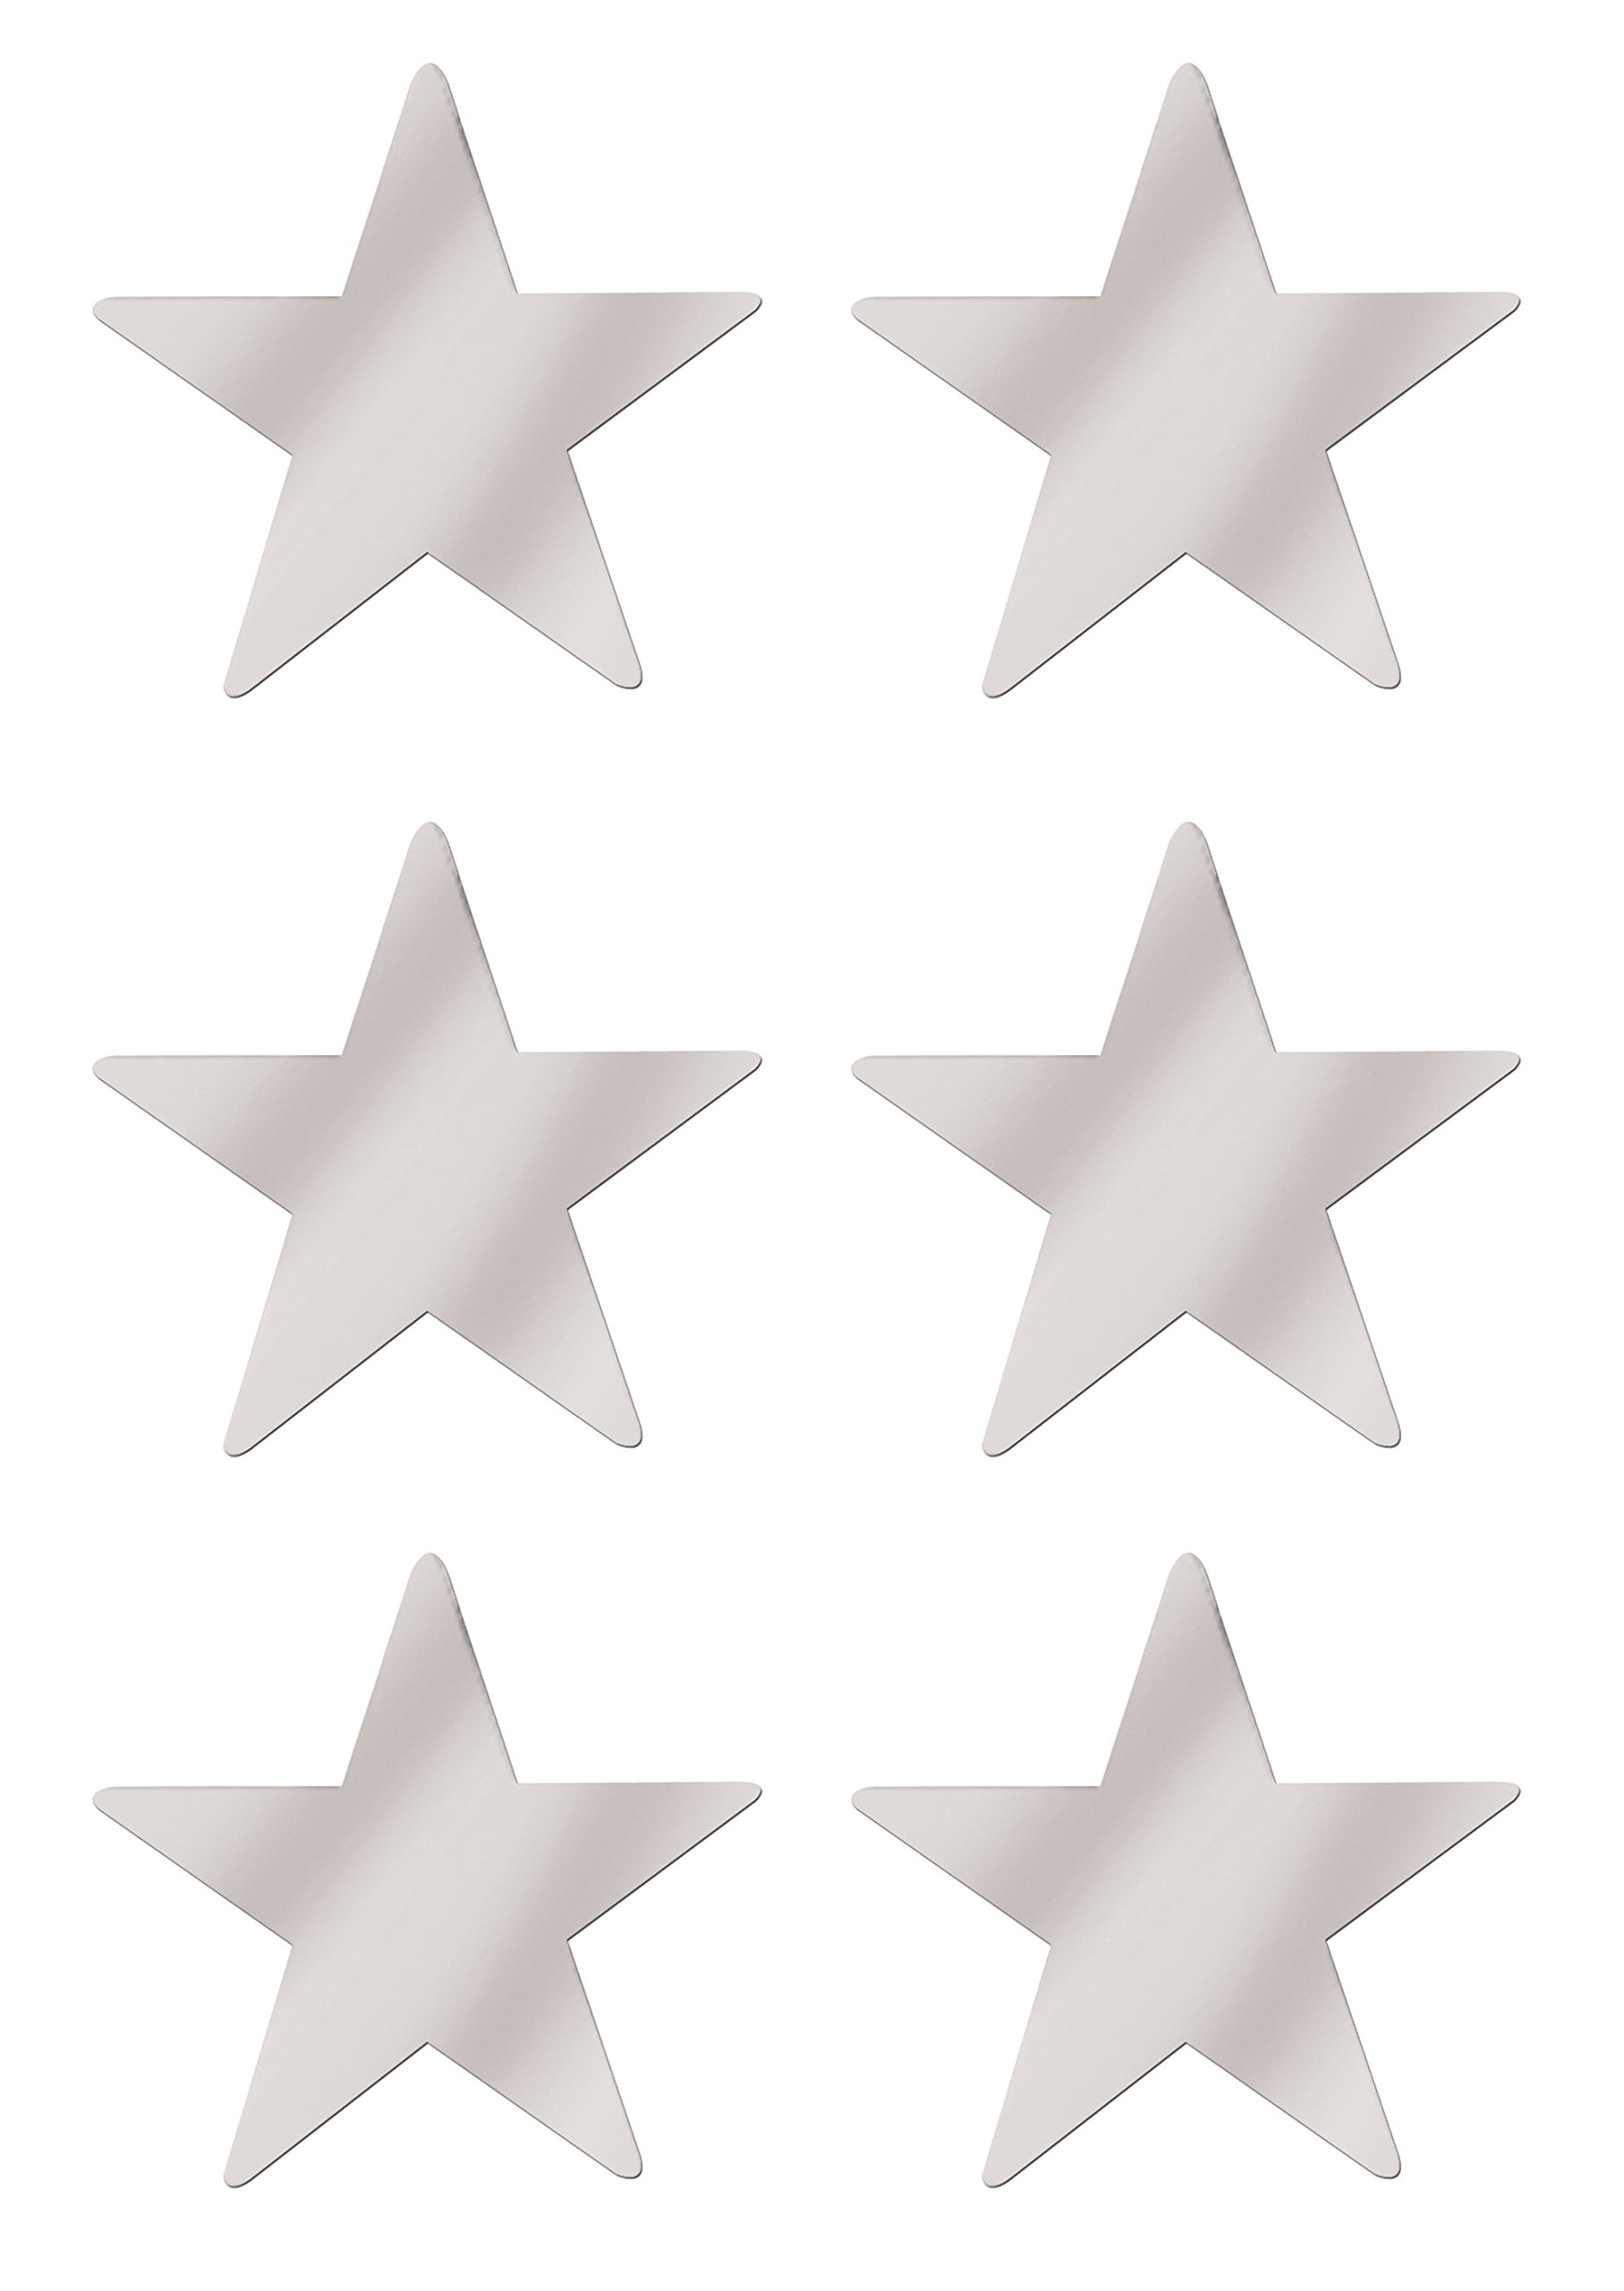 Beistle S50998SAZ6, 6 Piece Jumbo Foil Star Cutouts, 20'' (Silver) by Beistle